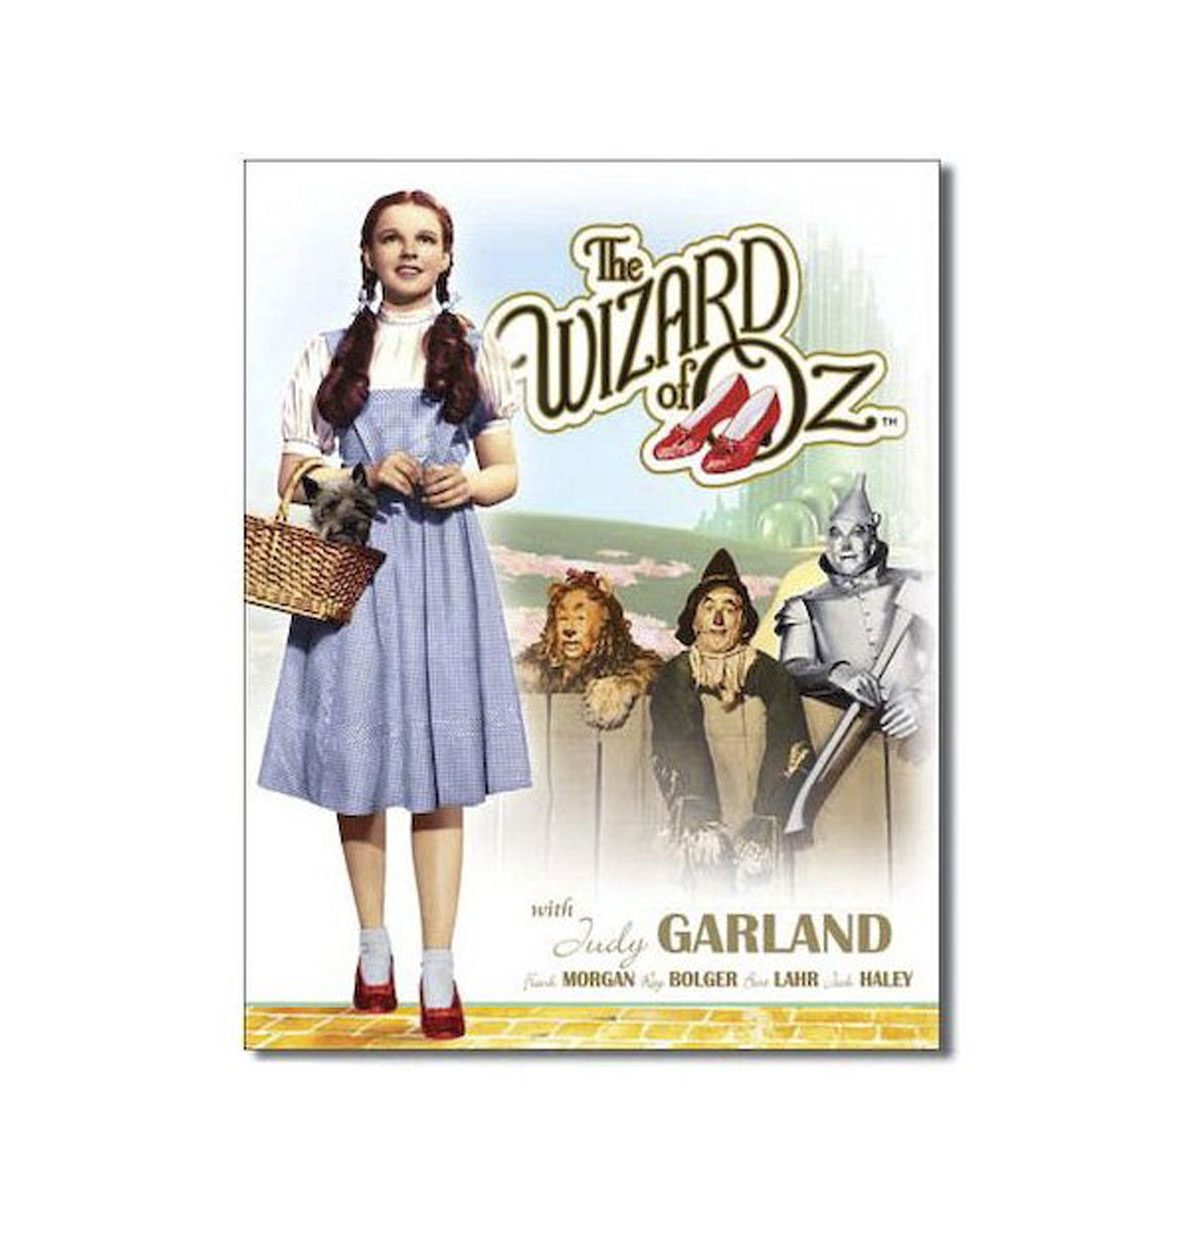 Wizard of Oz Film Poster Metalen Bord